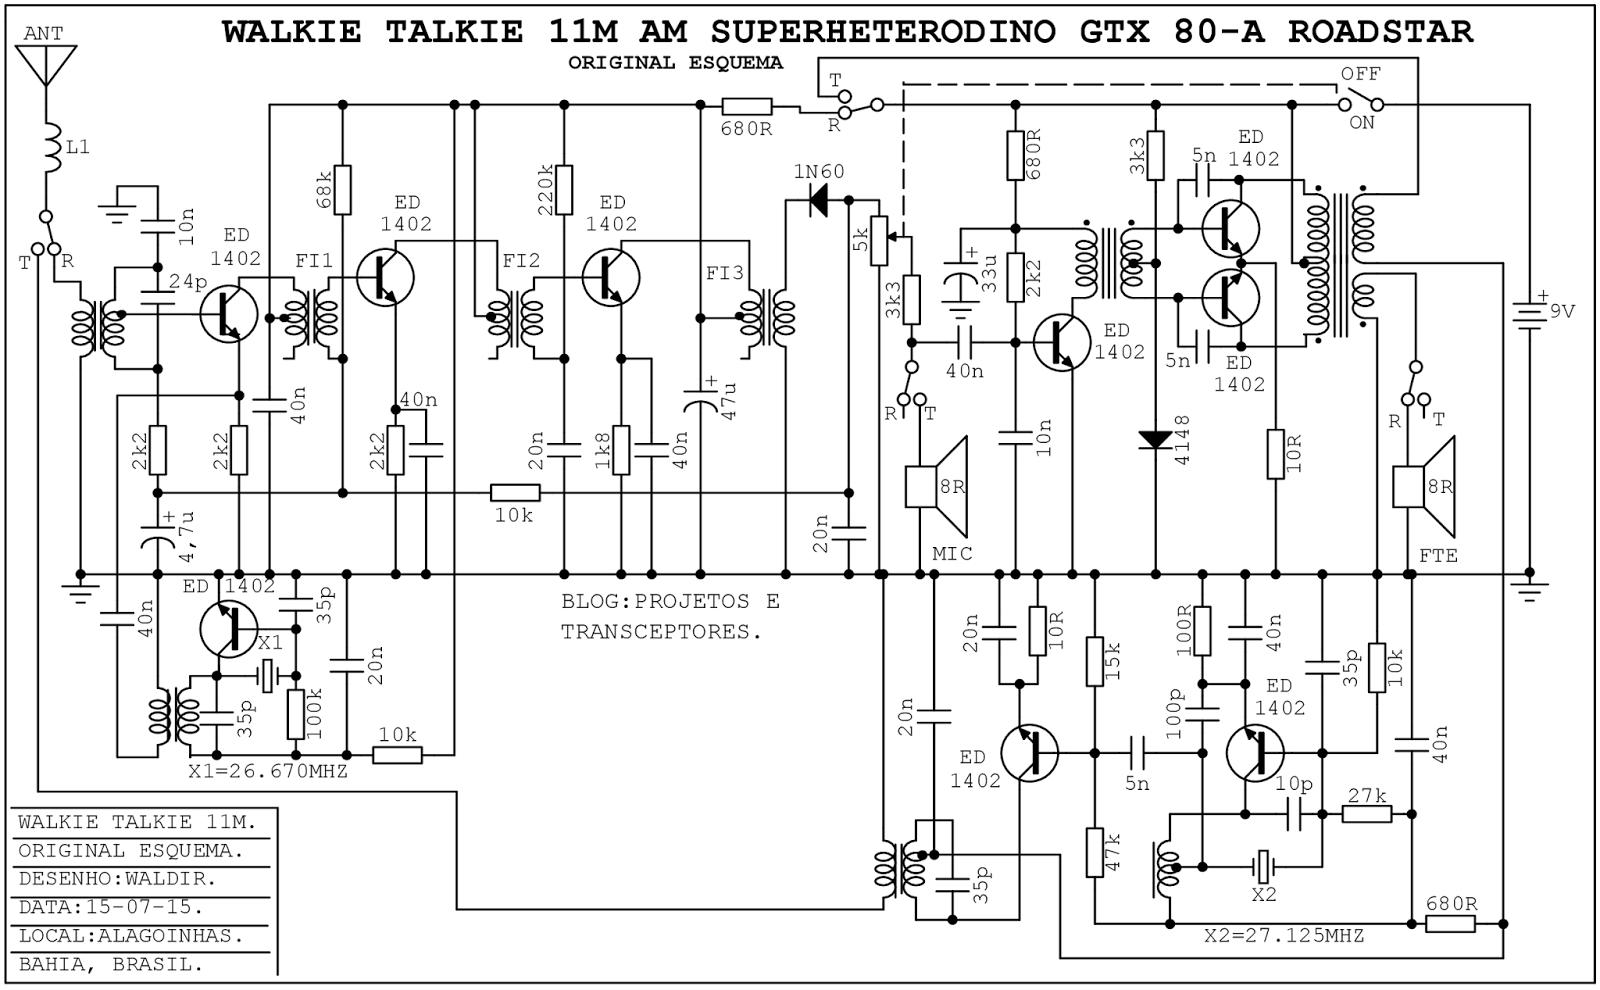 projetos e transceptores   walkie talkie am cb roadstar